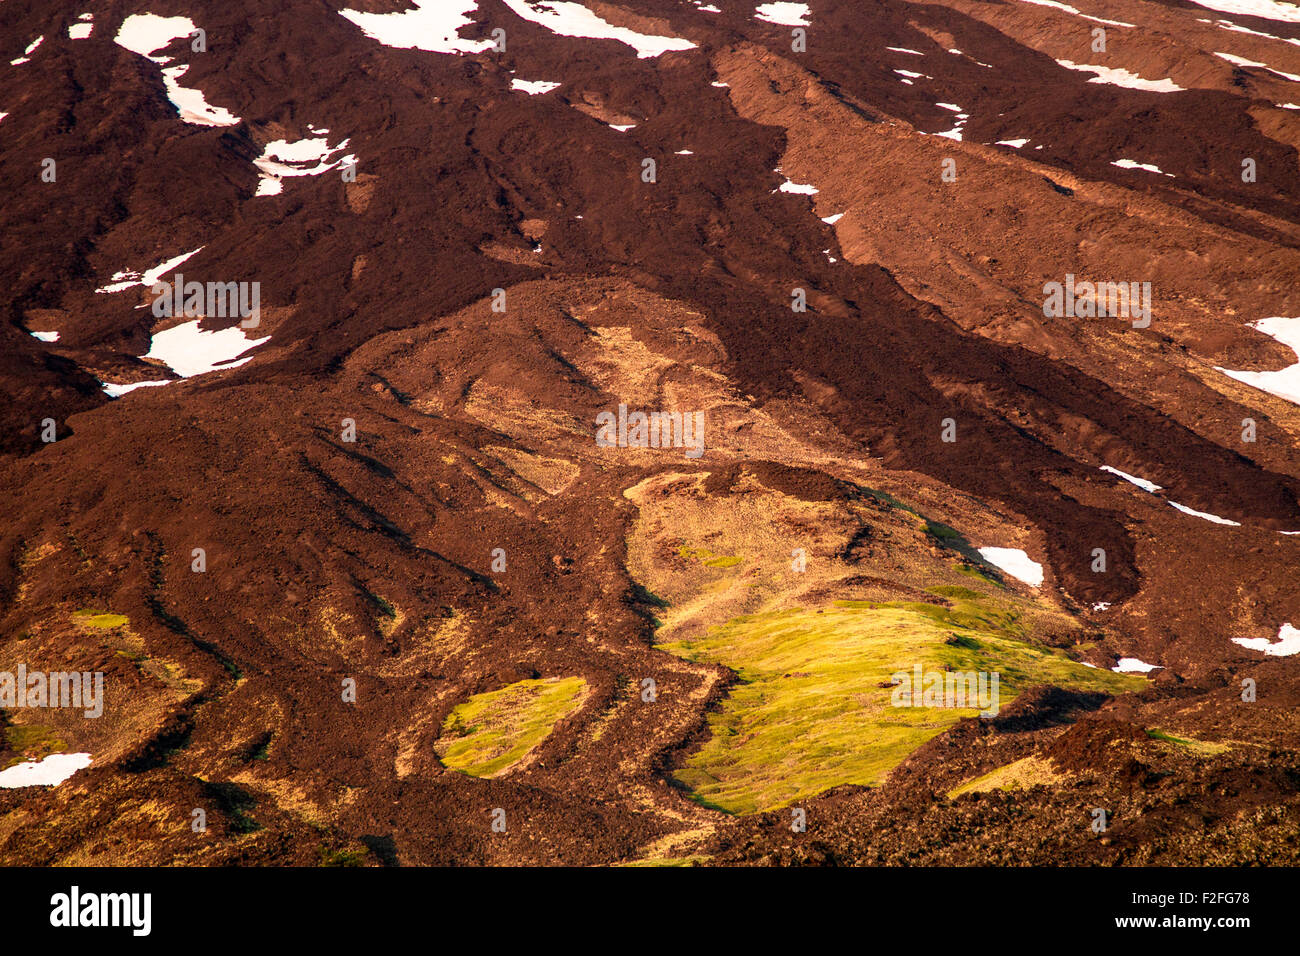 Lava flow on volcano Etna - Stock Image